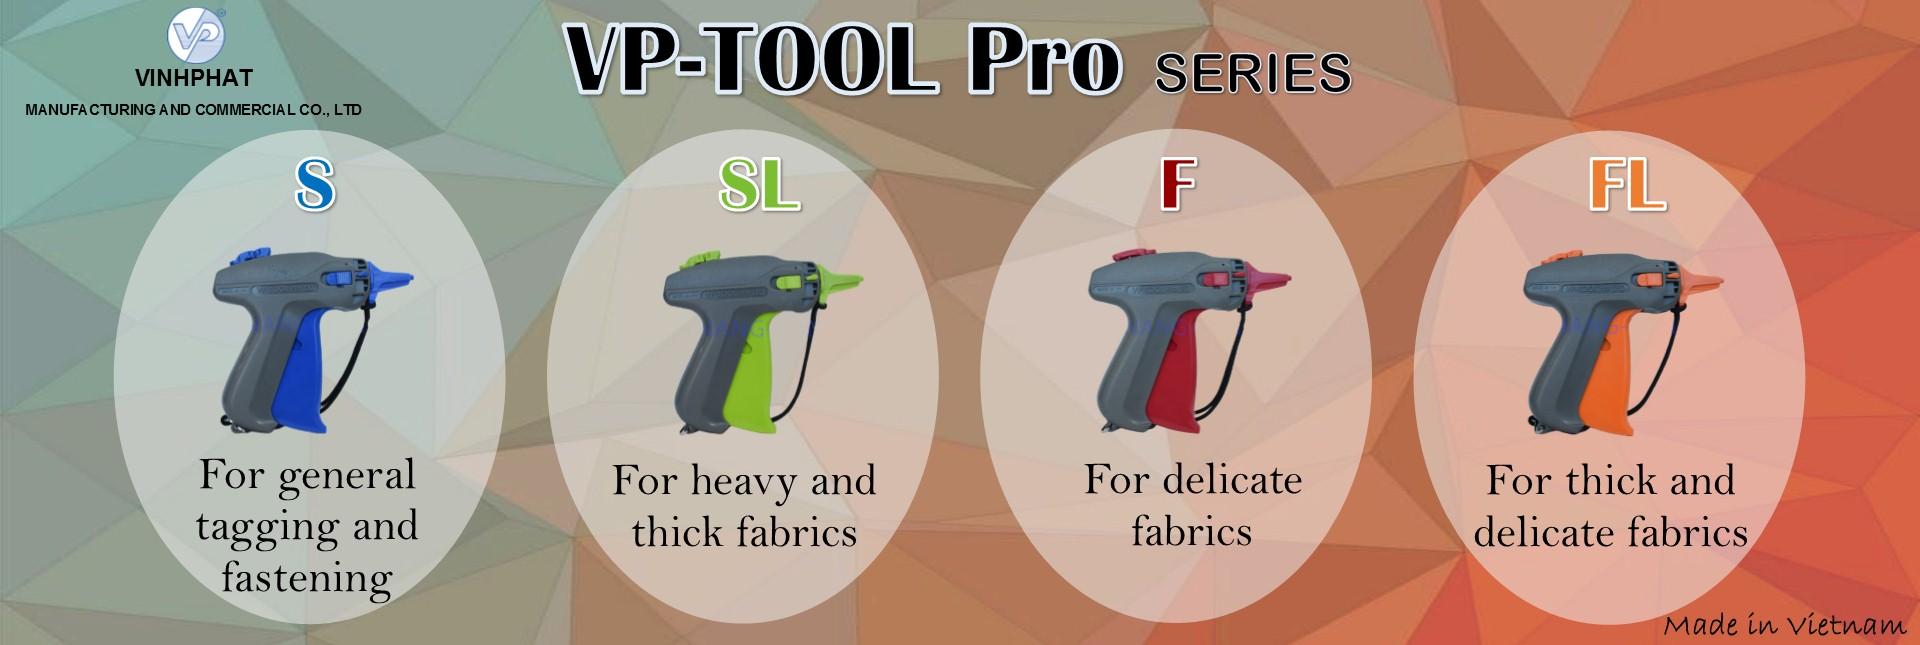 VP Tool Pro